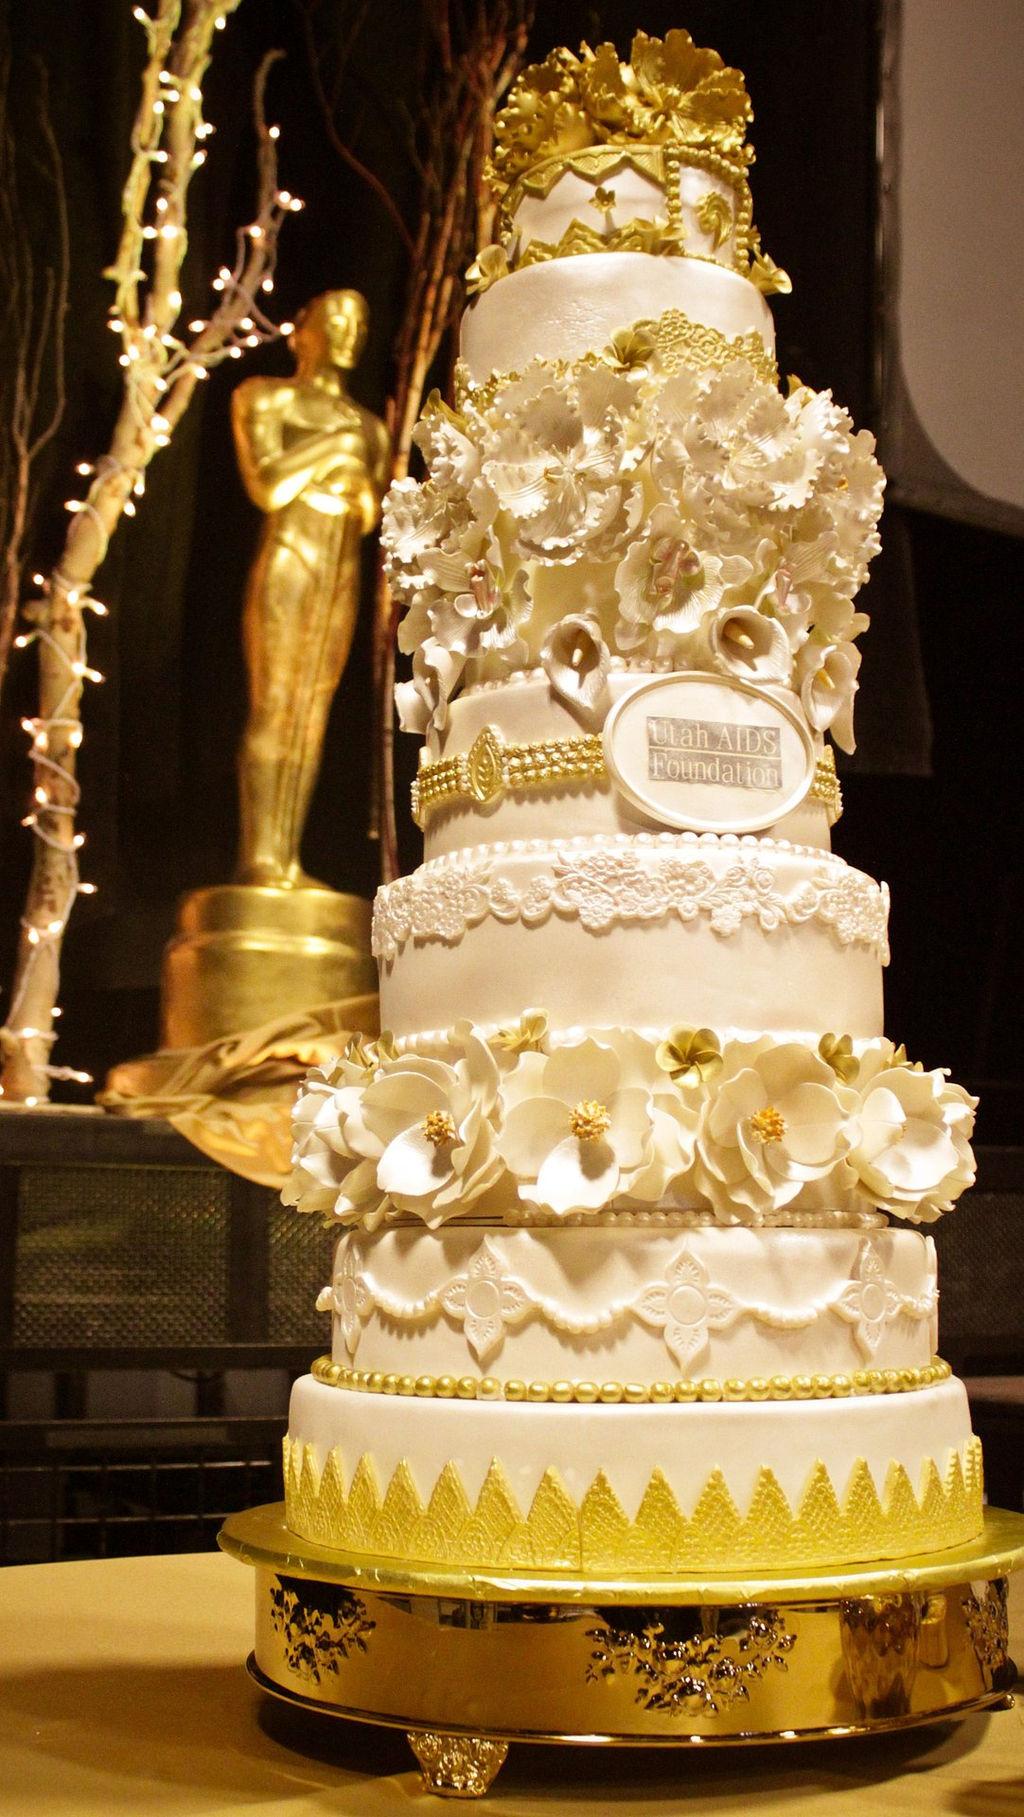 Gourmet Cakes by Socorro, Utah Wedding Cakes | Wix.com